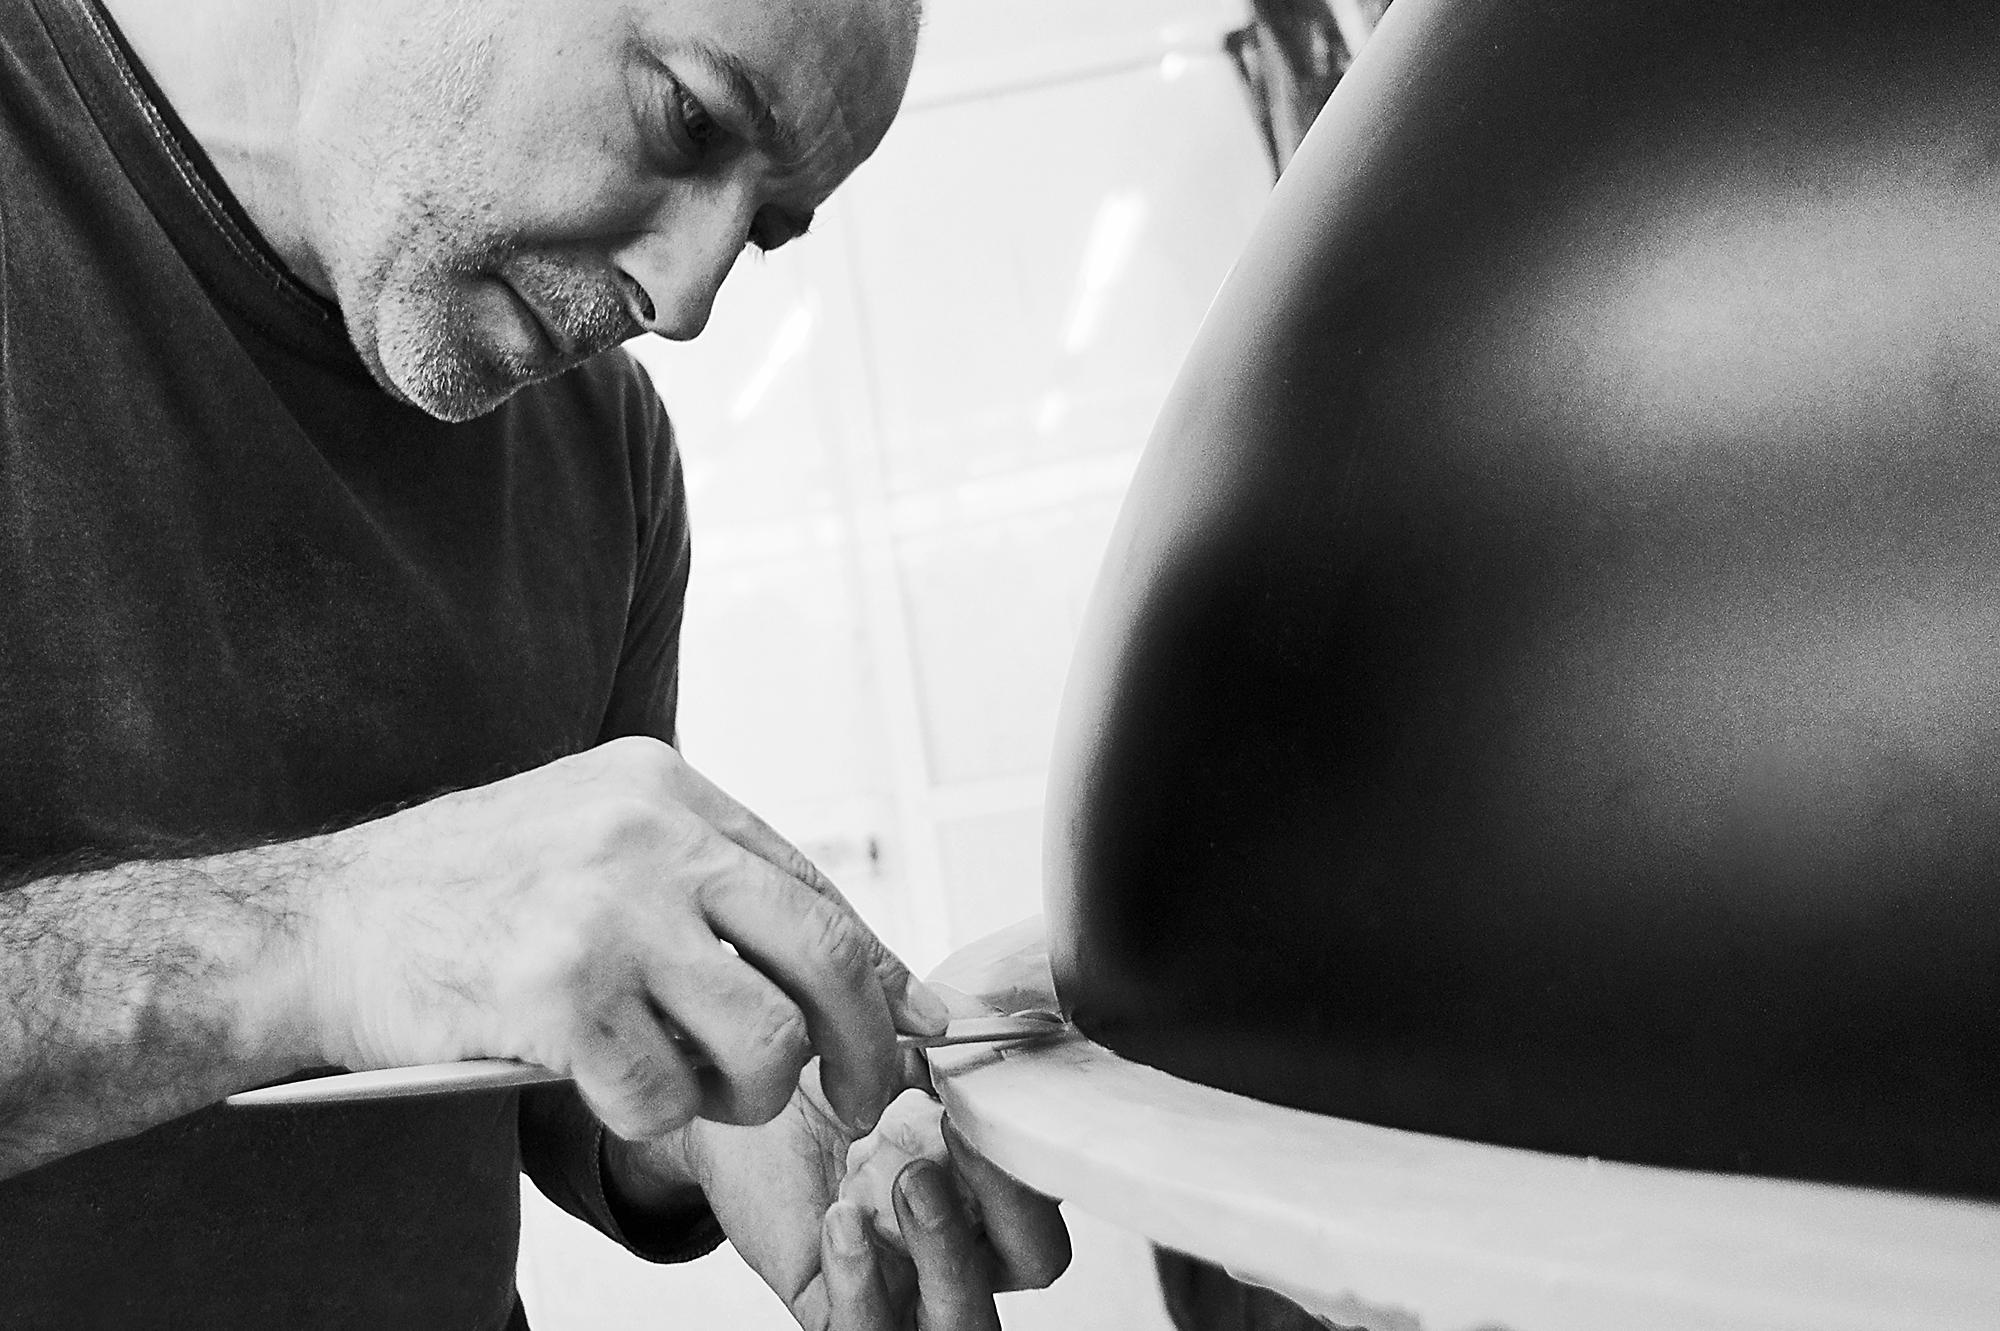 Albino Miranda a Esculpir uma Peça